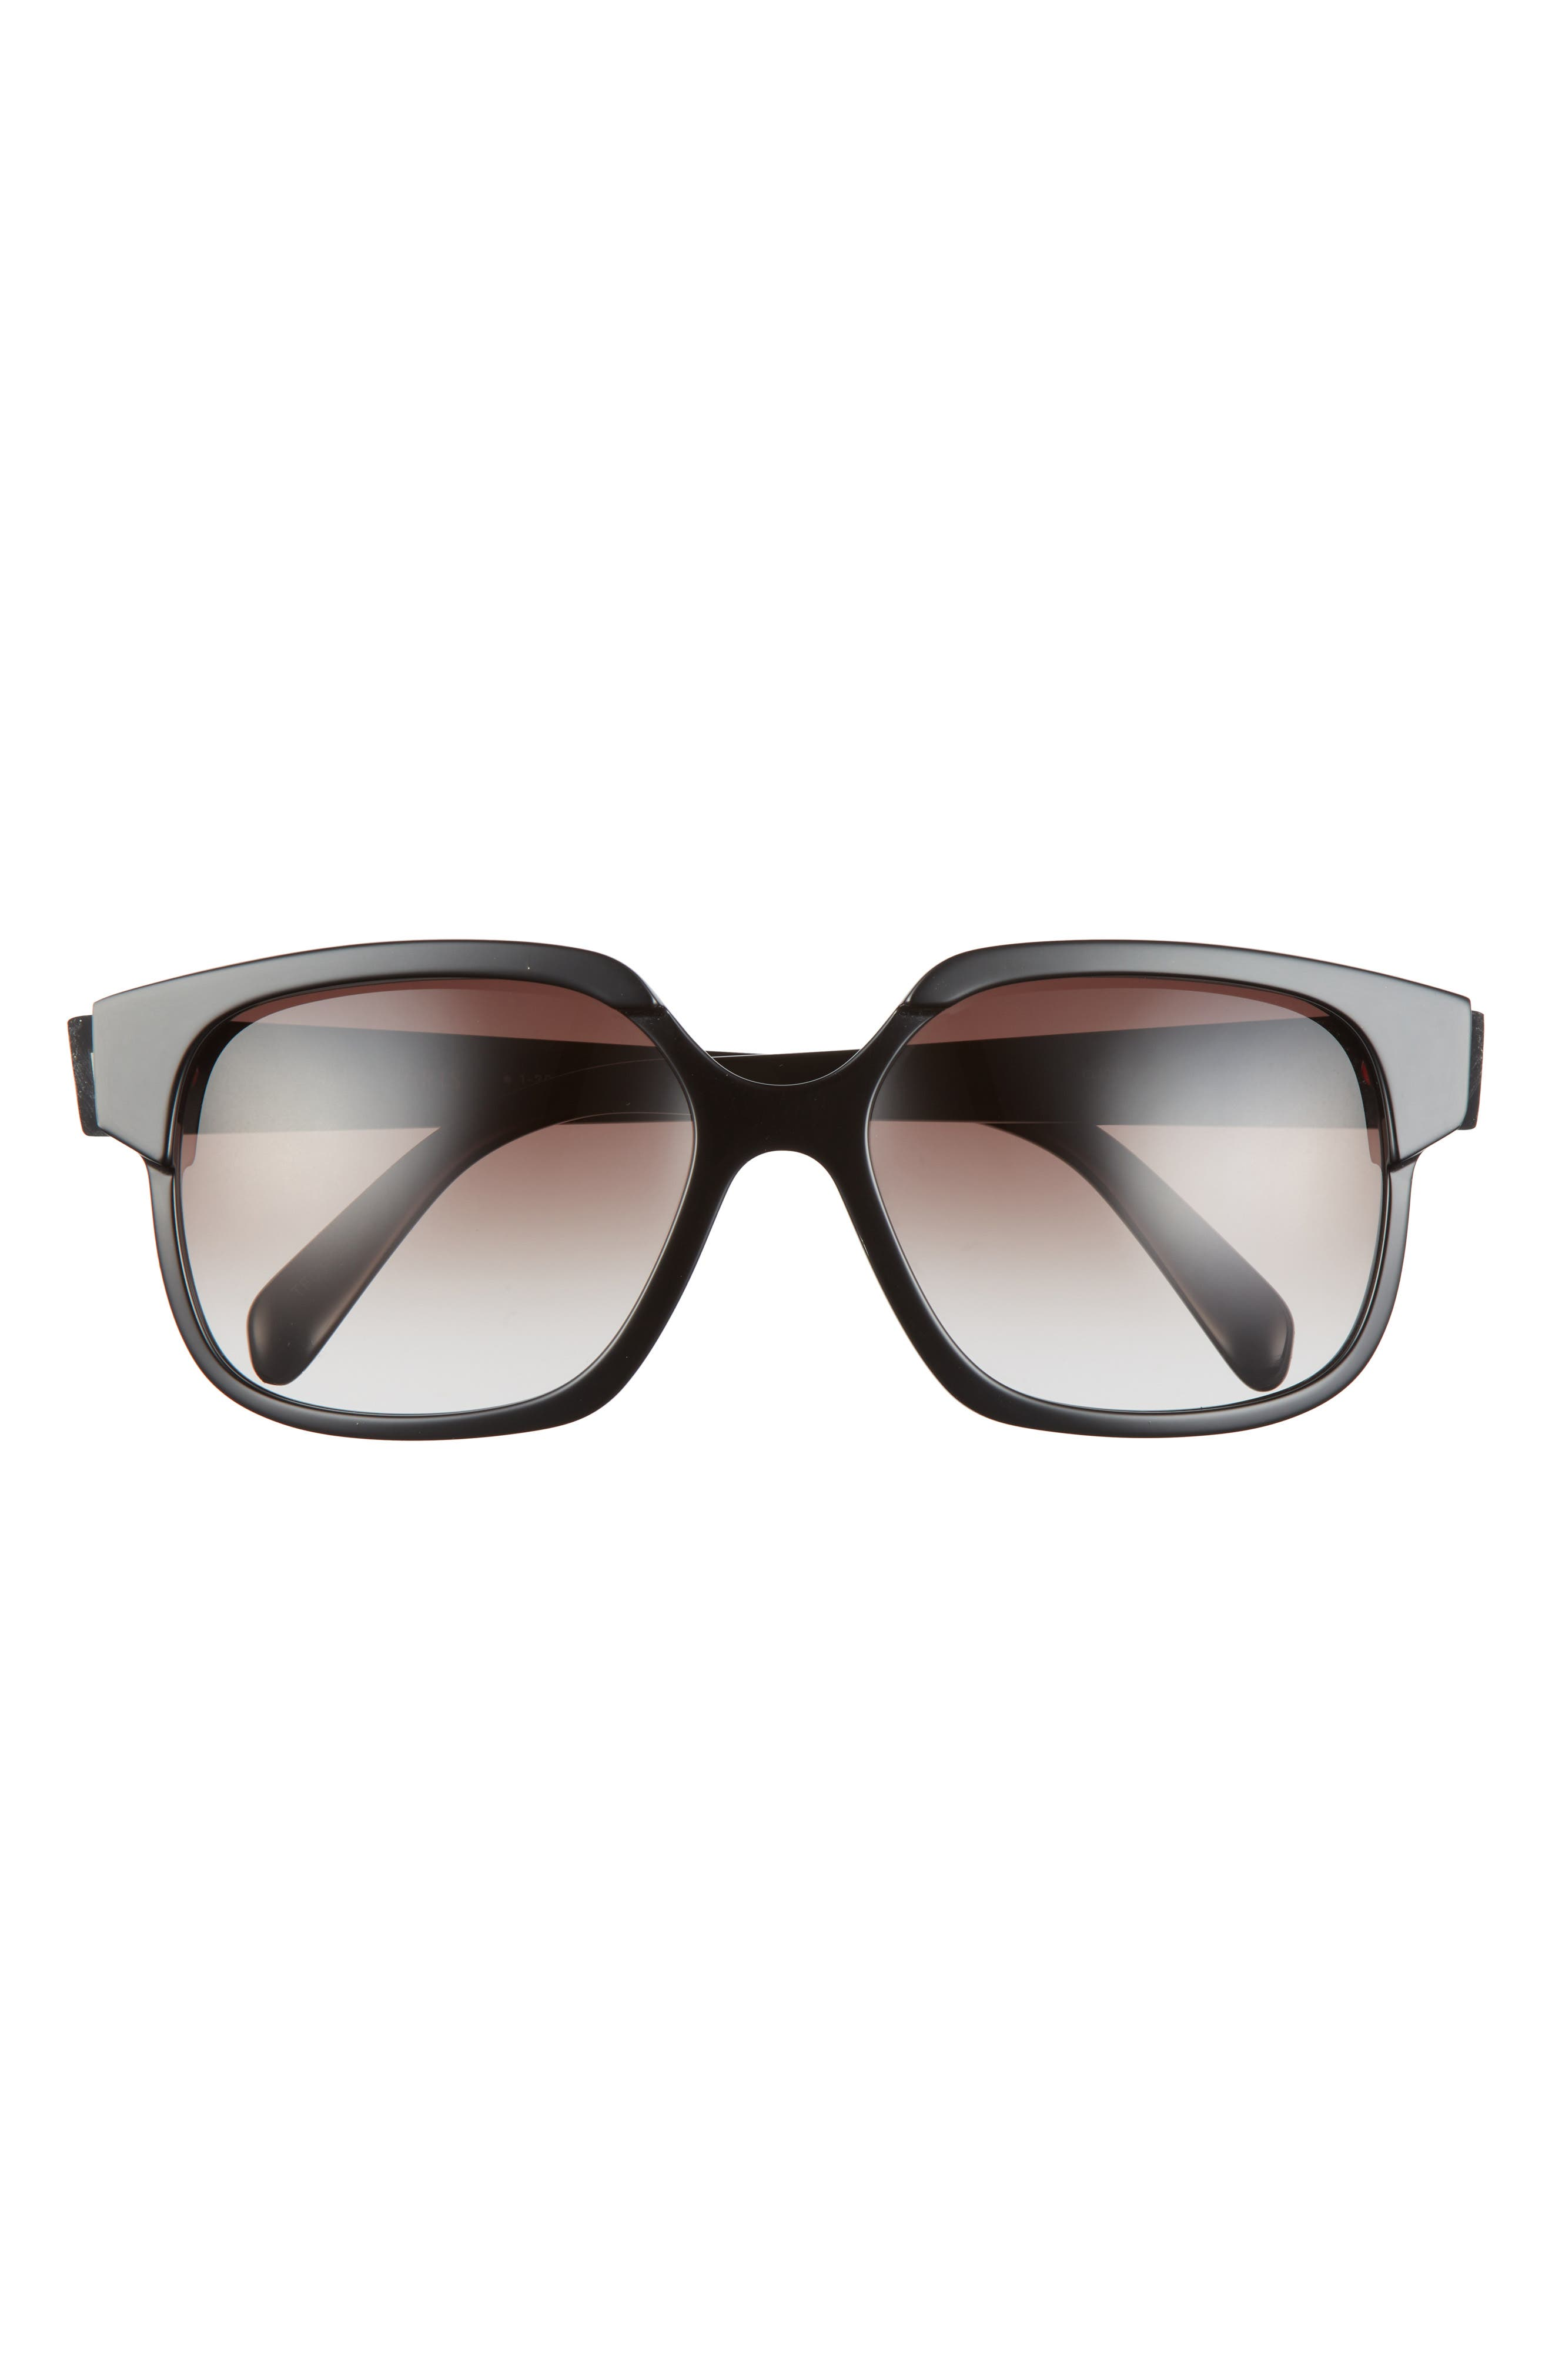 59mm Gradient Rectangle Sunglasses